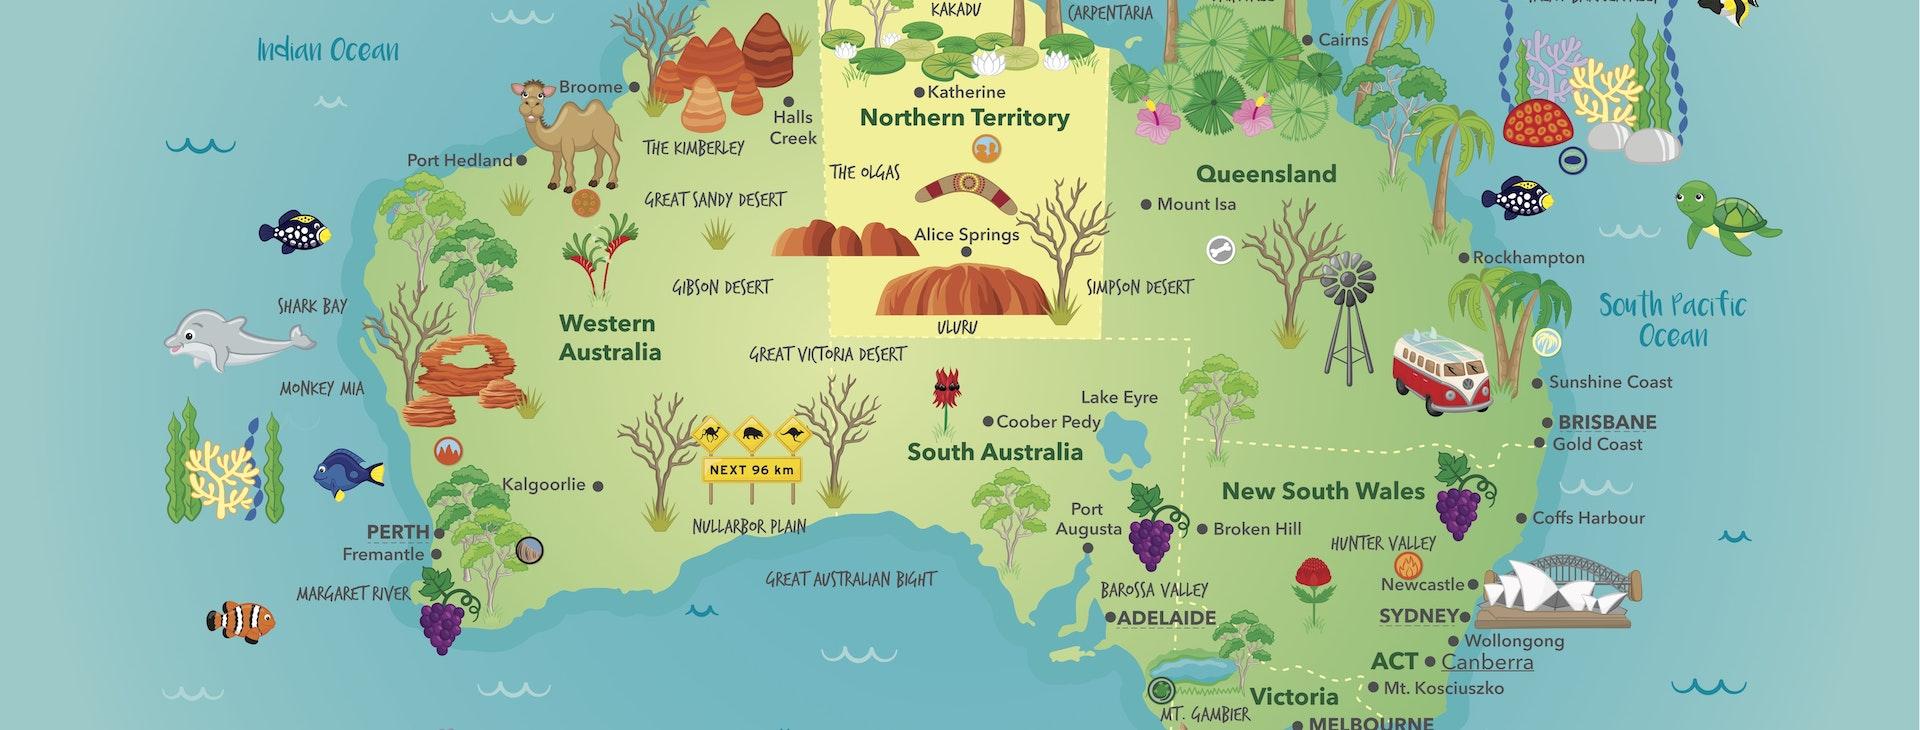 Map of Australia lesson - Inquisitive Lesson